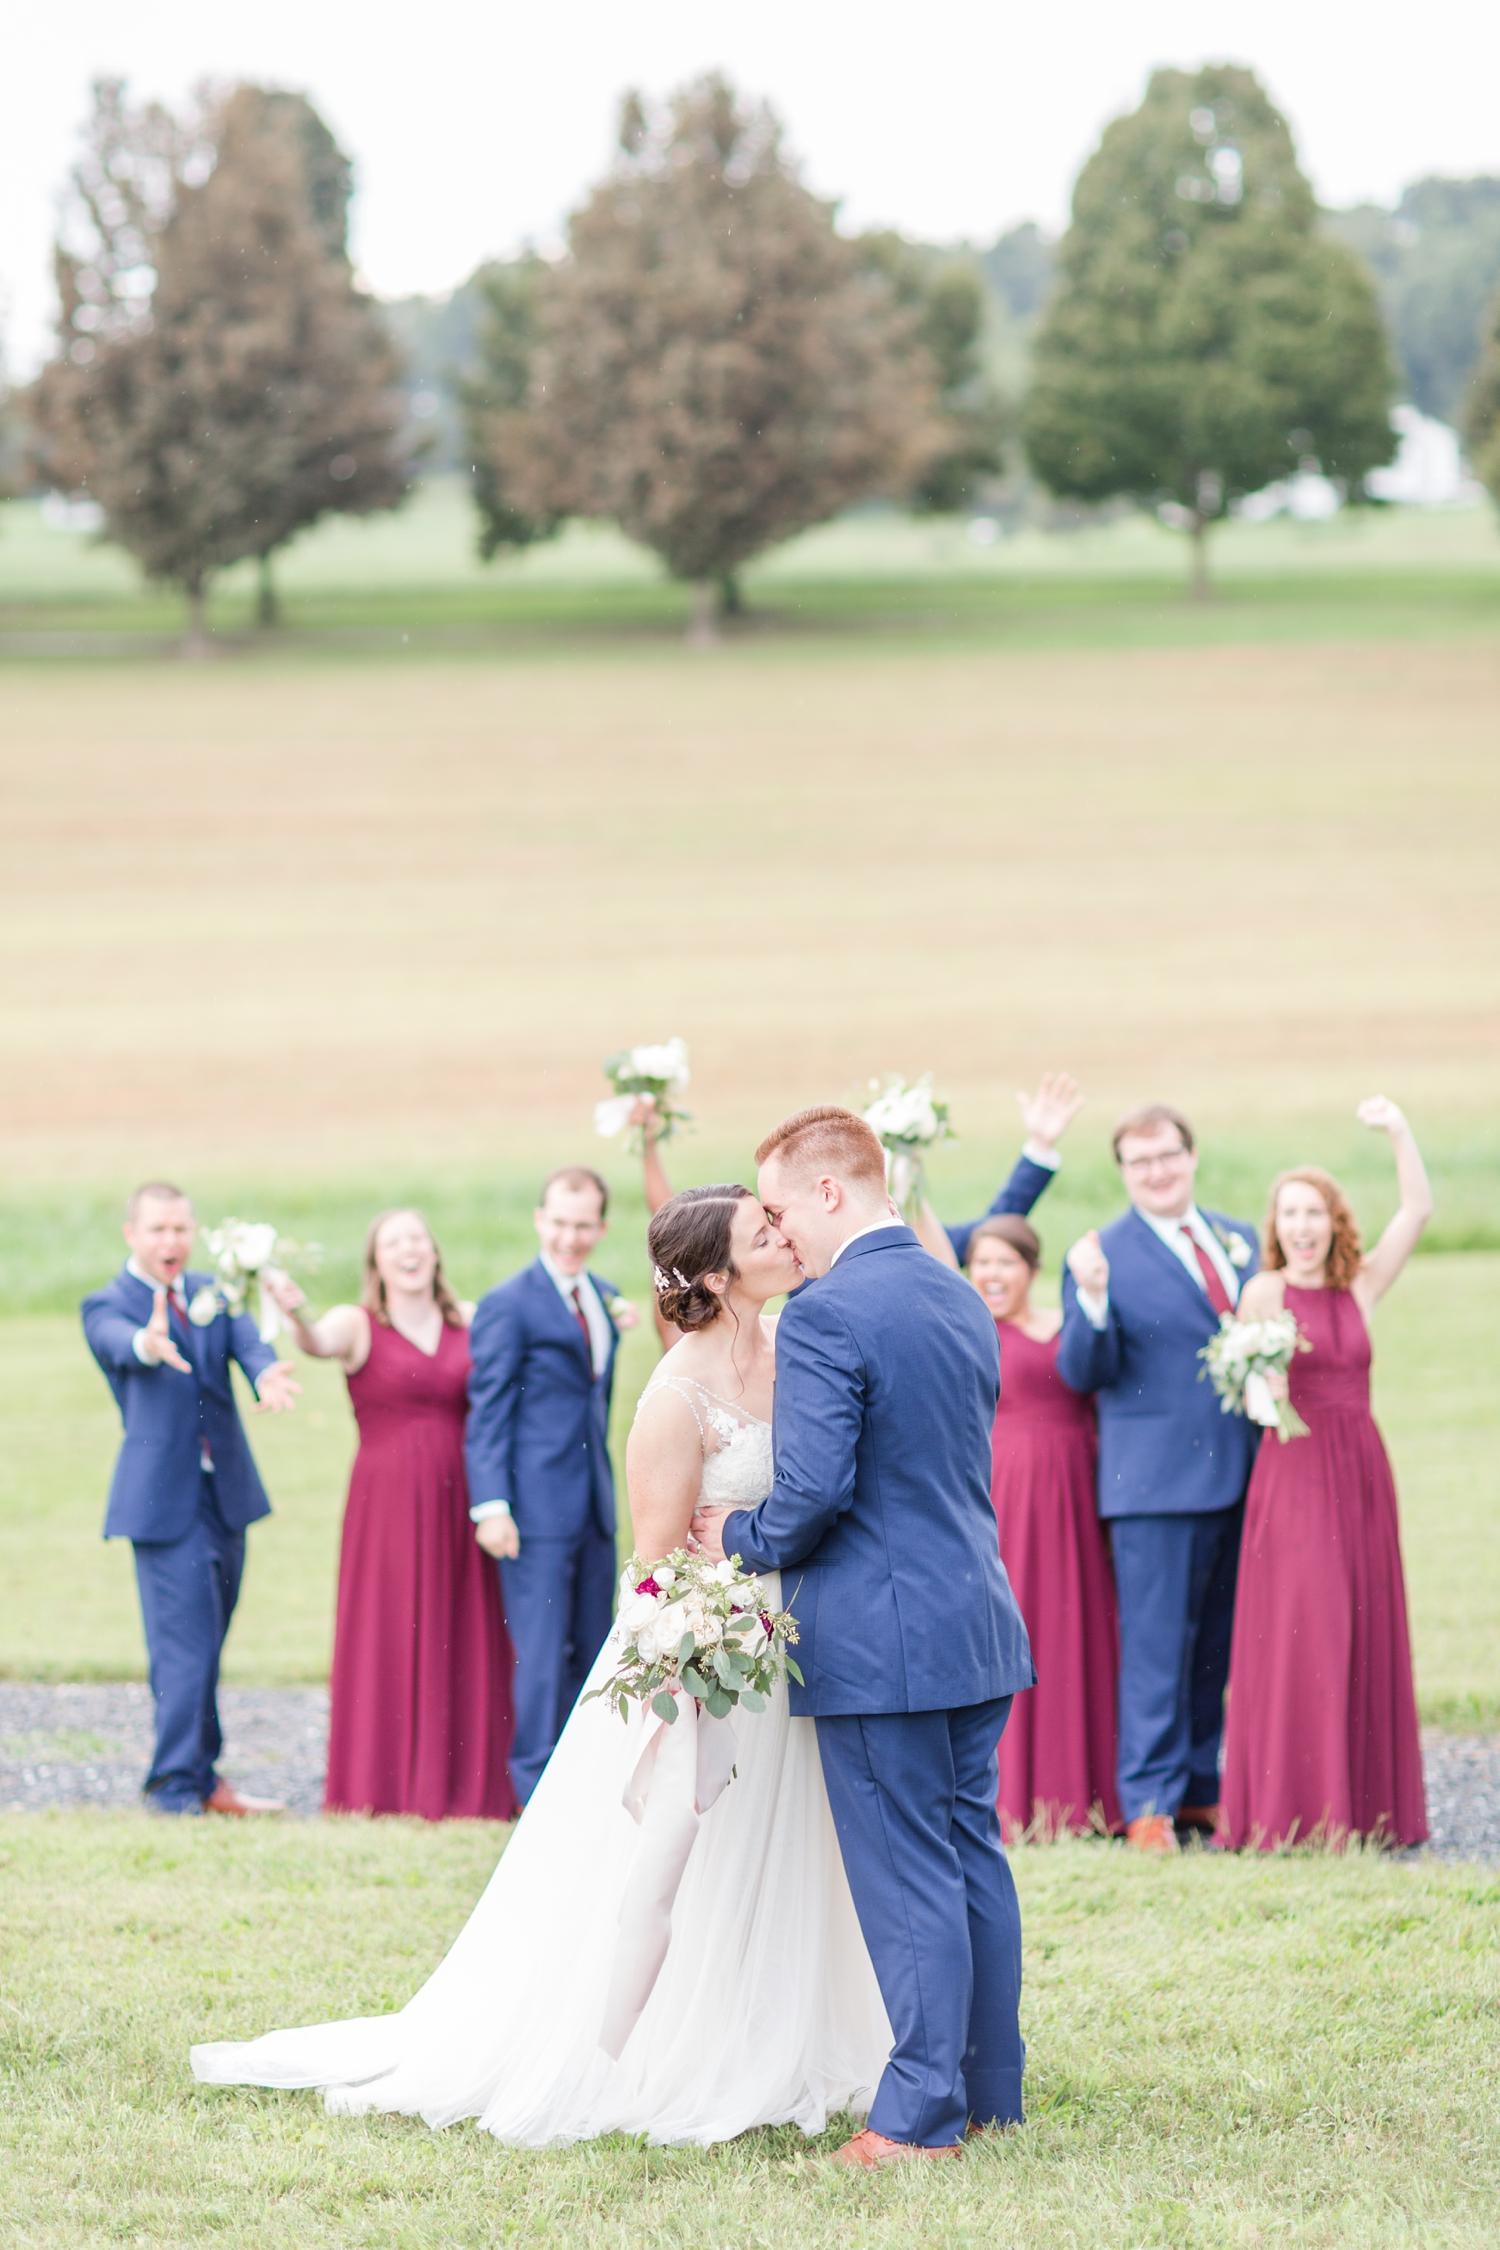 ADKINS WEDDING HIGHLIGHTS-174_The-Granary-wedding-Valley-Pike-Farm-Market-Virginia-wedding-photographer-anna-grace-photography-photo.jpg